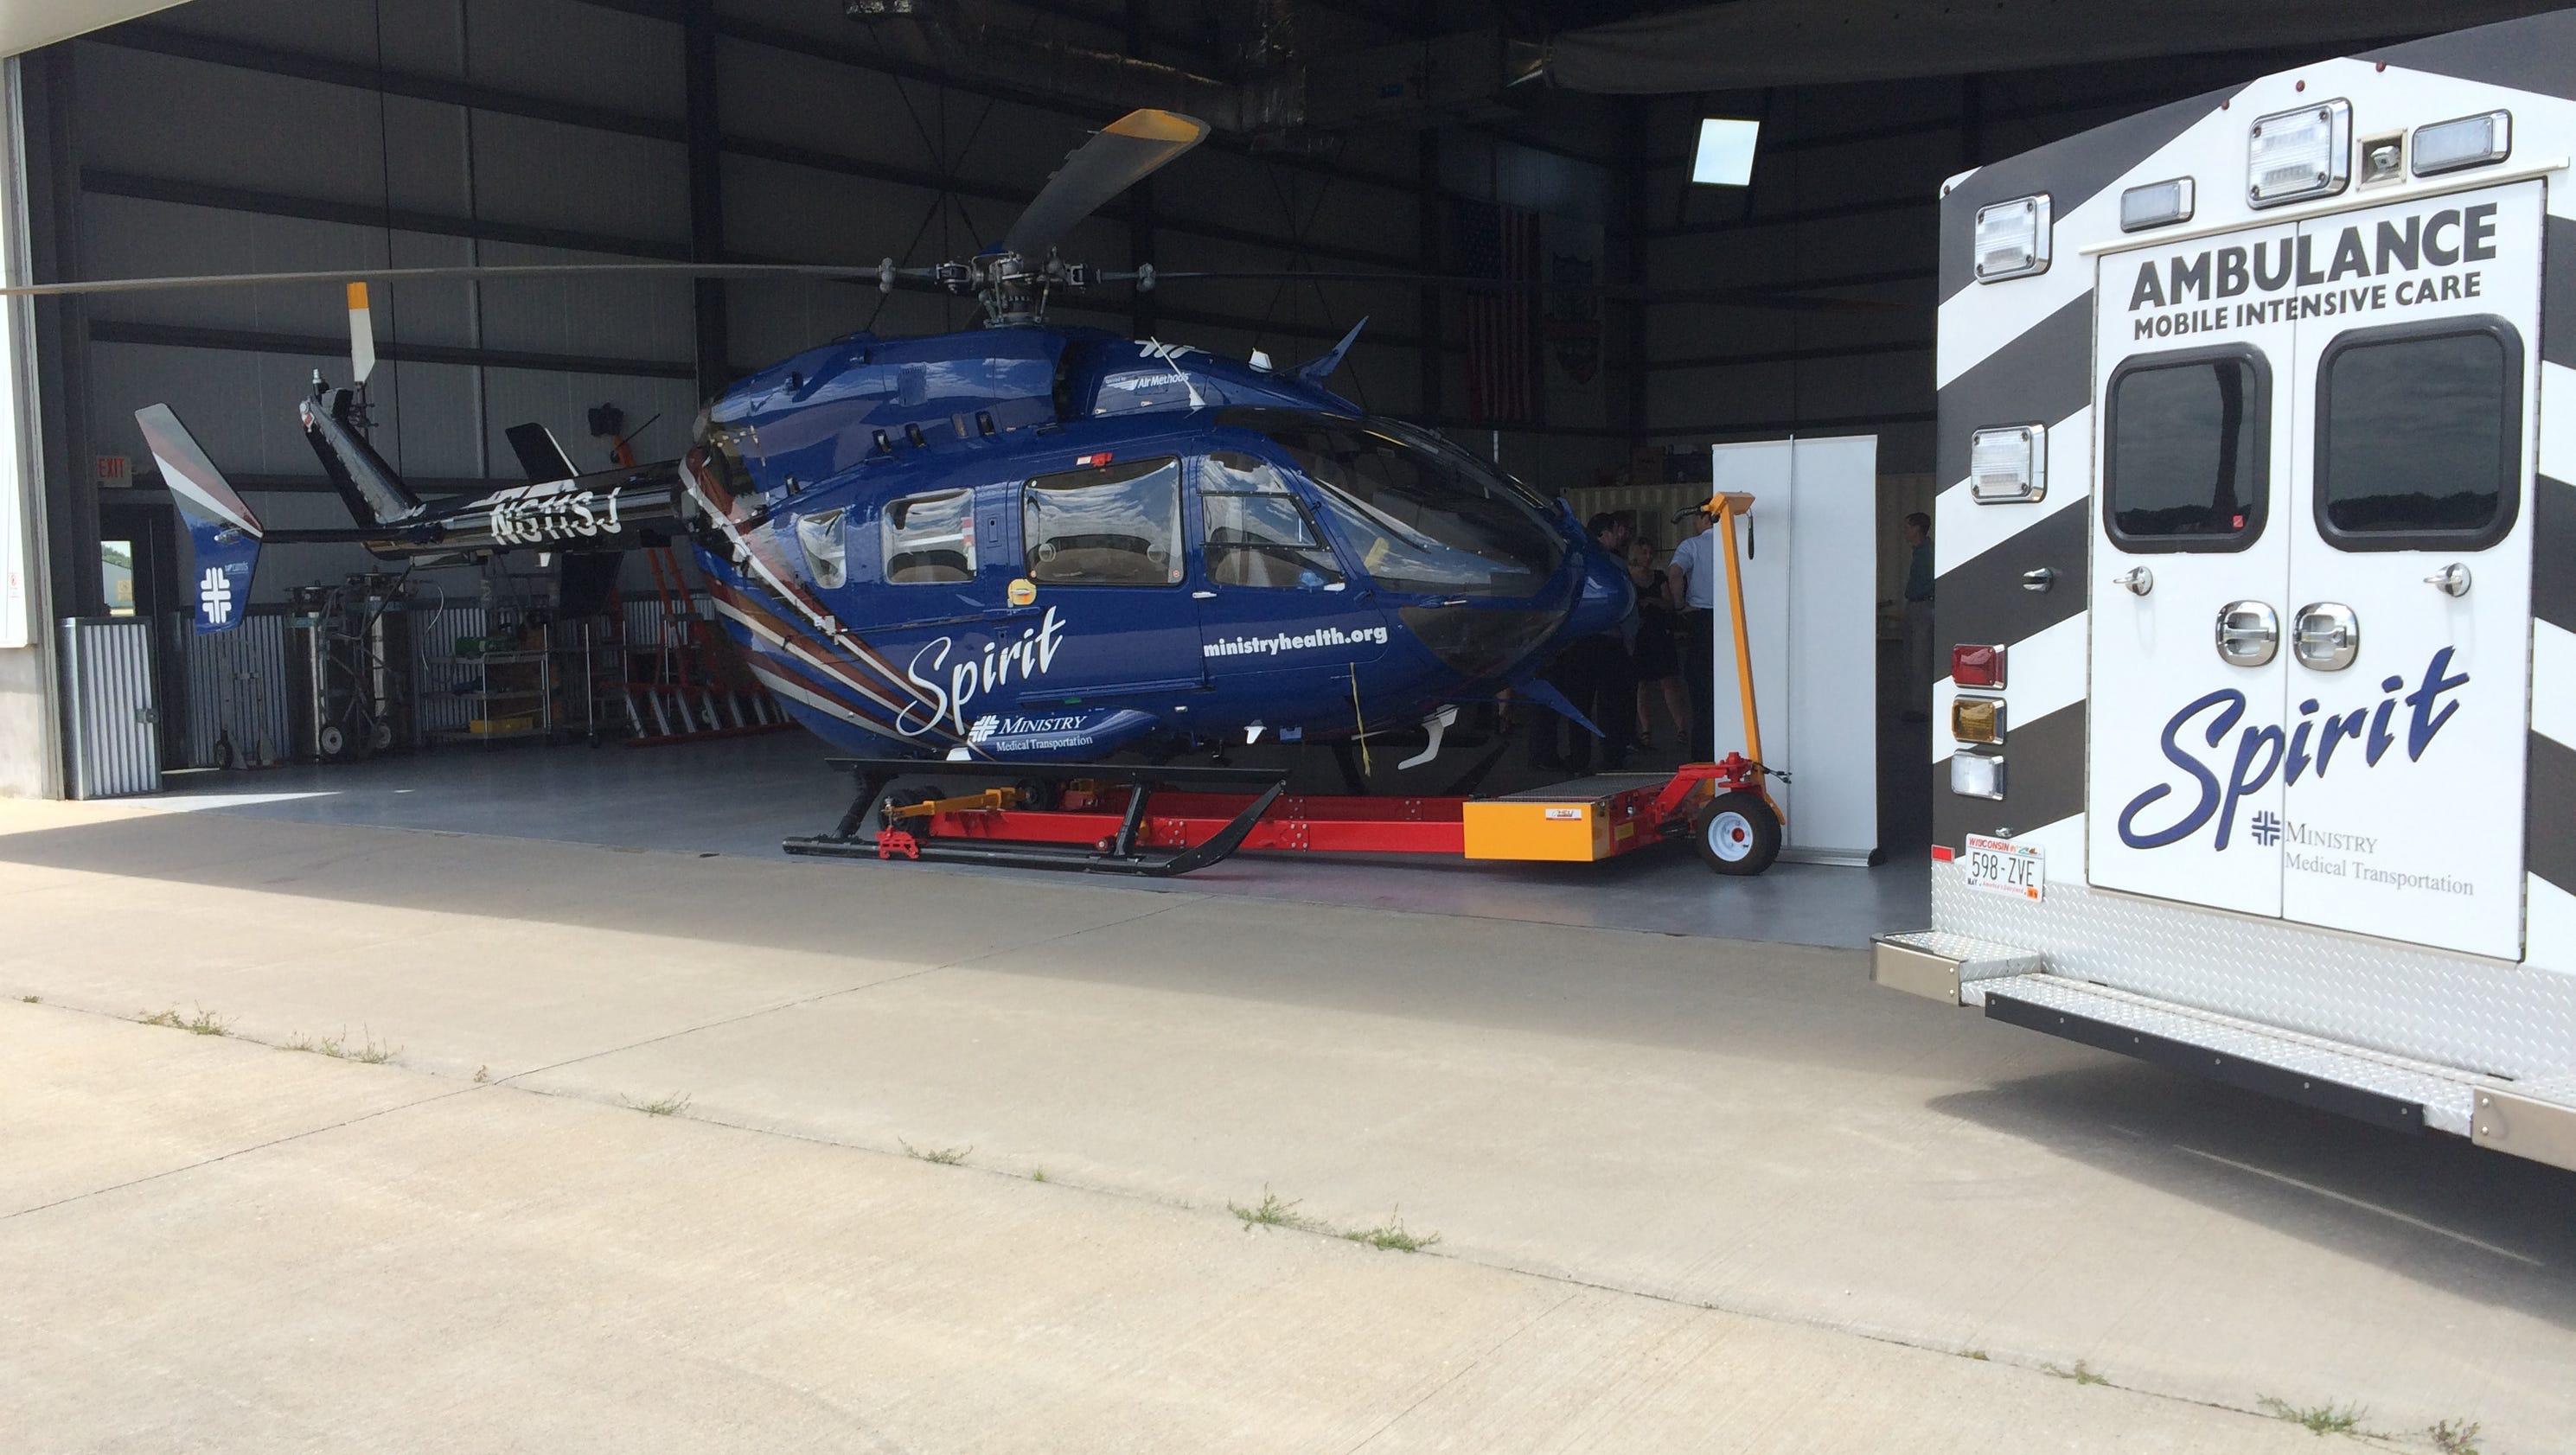 spirit medical transportation services moves to stevens point